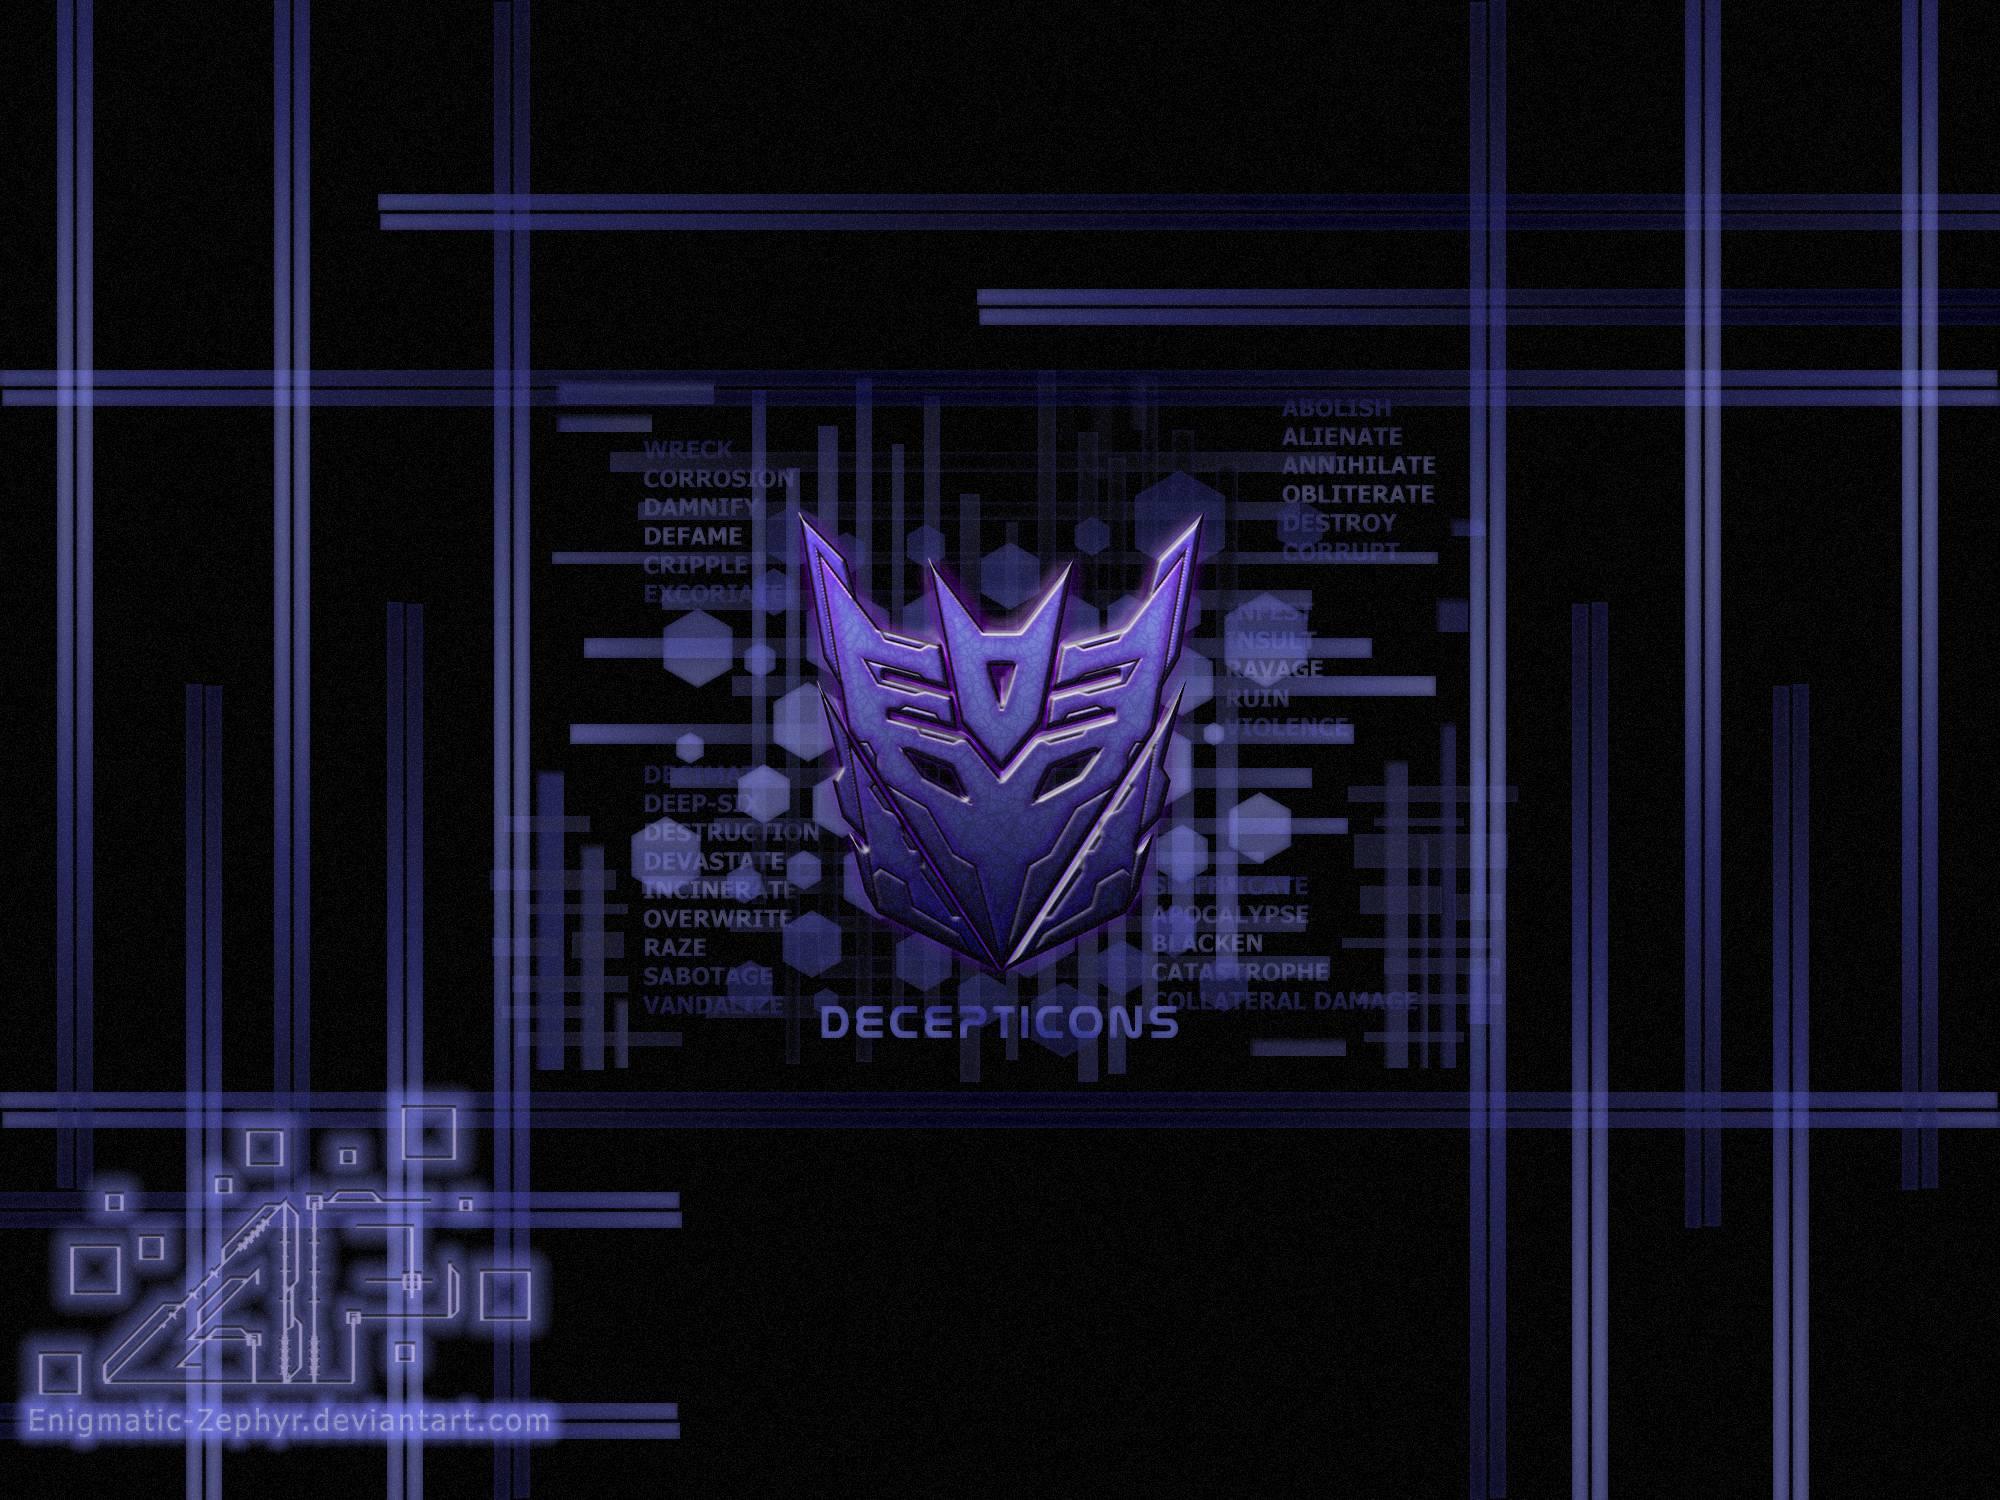 Decepticon emblem II by Balsavor.deviantart.com on @deviantART ...